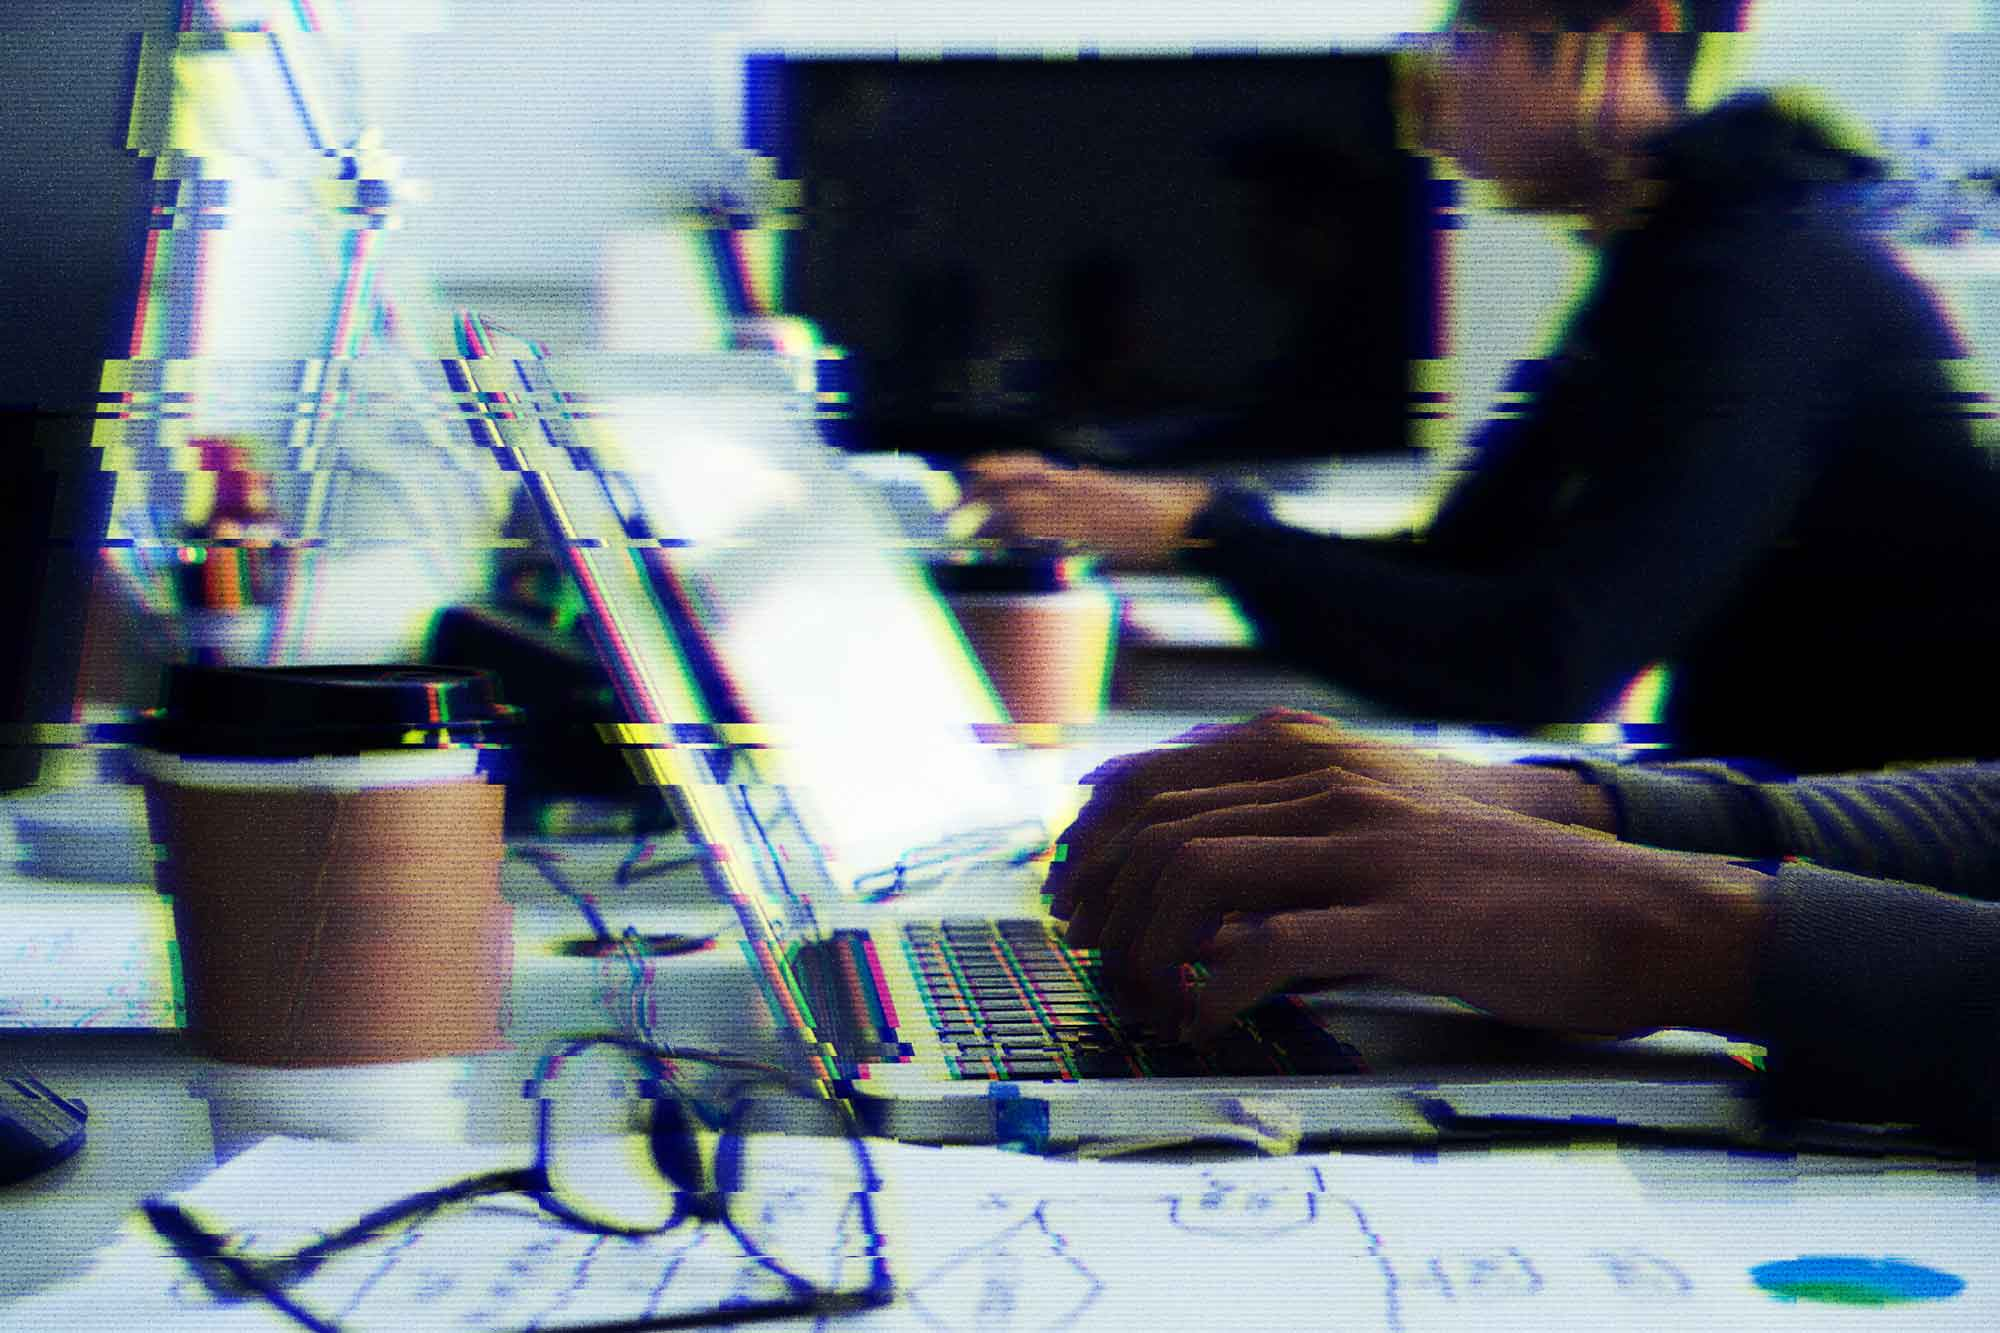 Should senior developers refuse interview coding challenges?